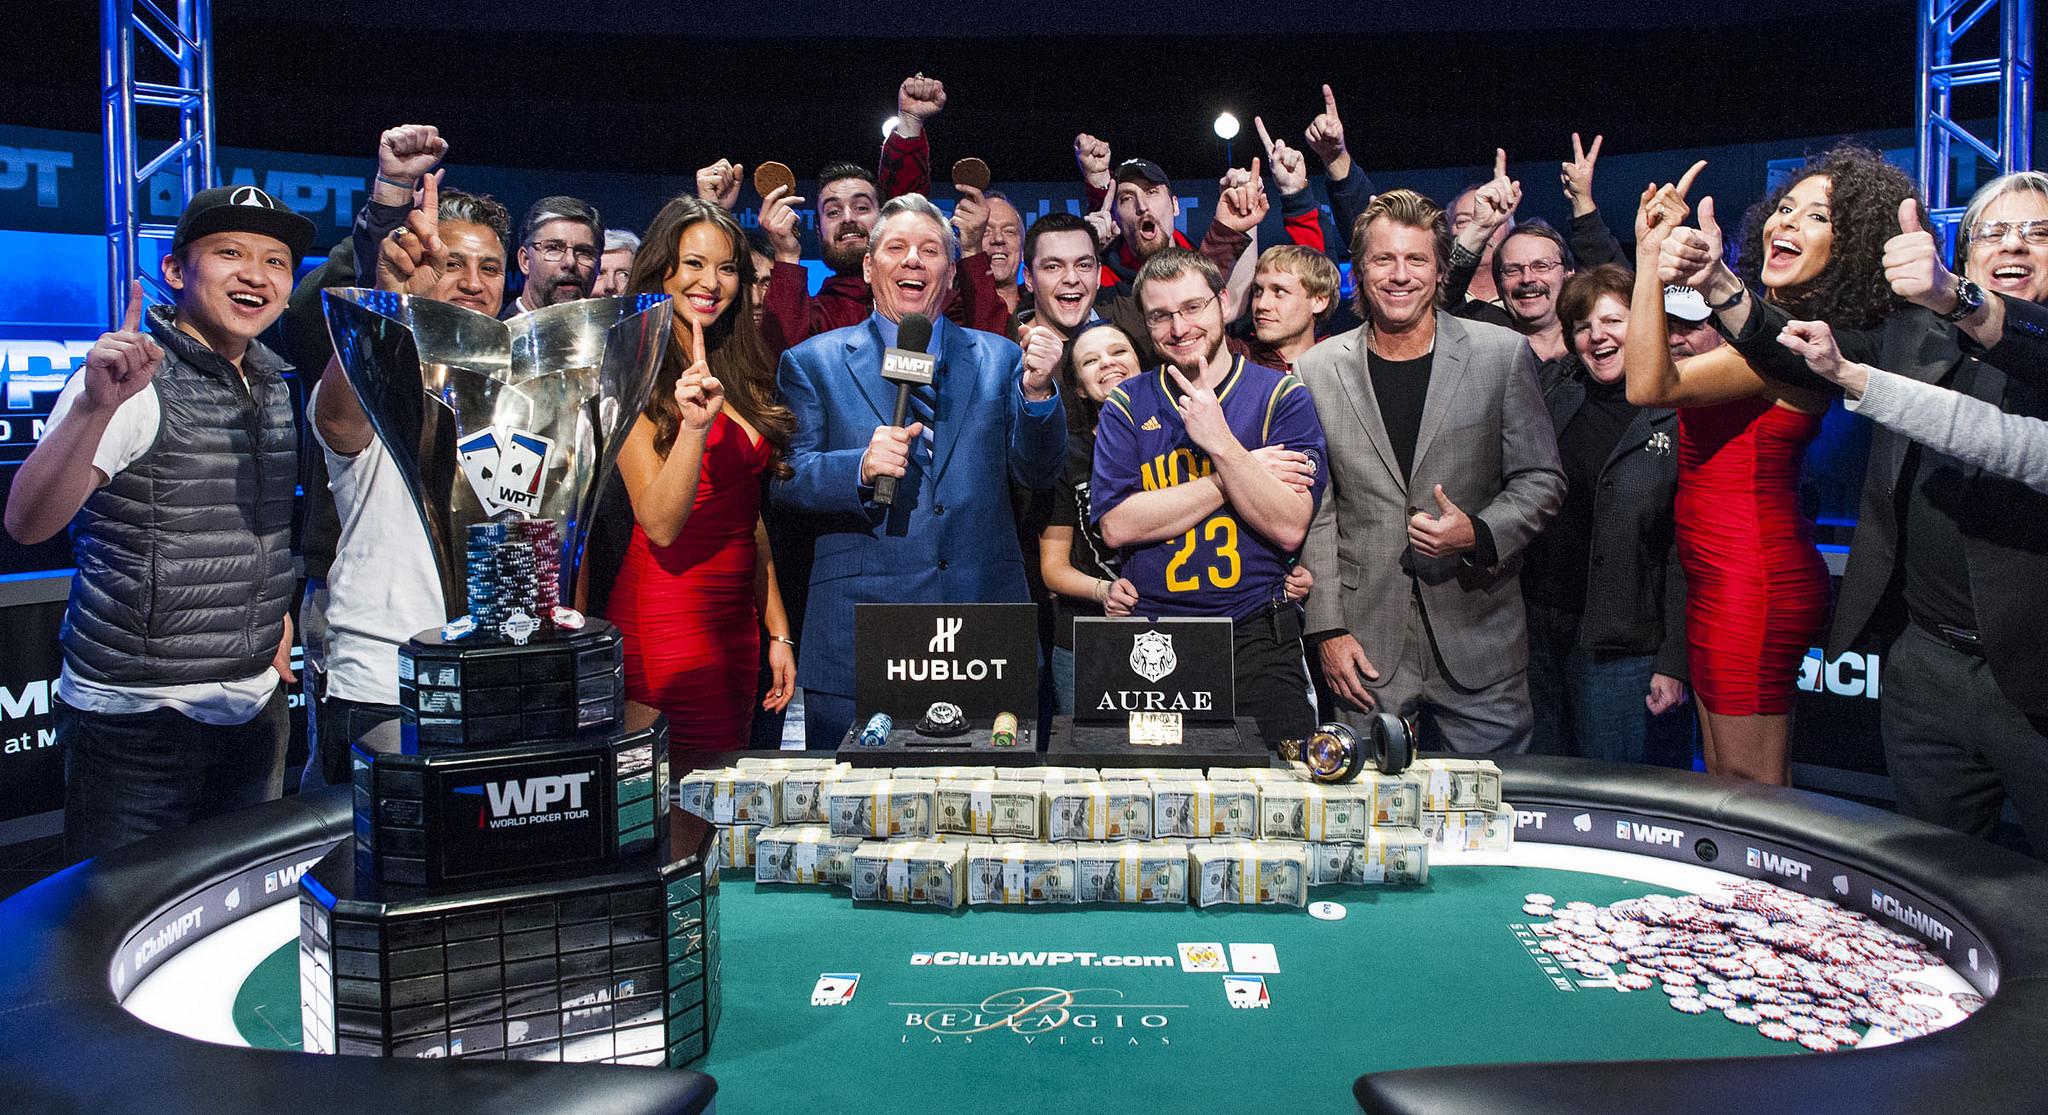 Wpt Poker Perth